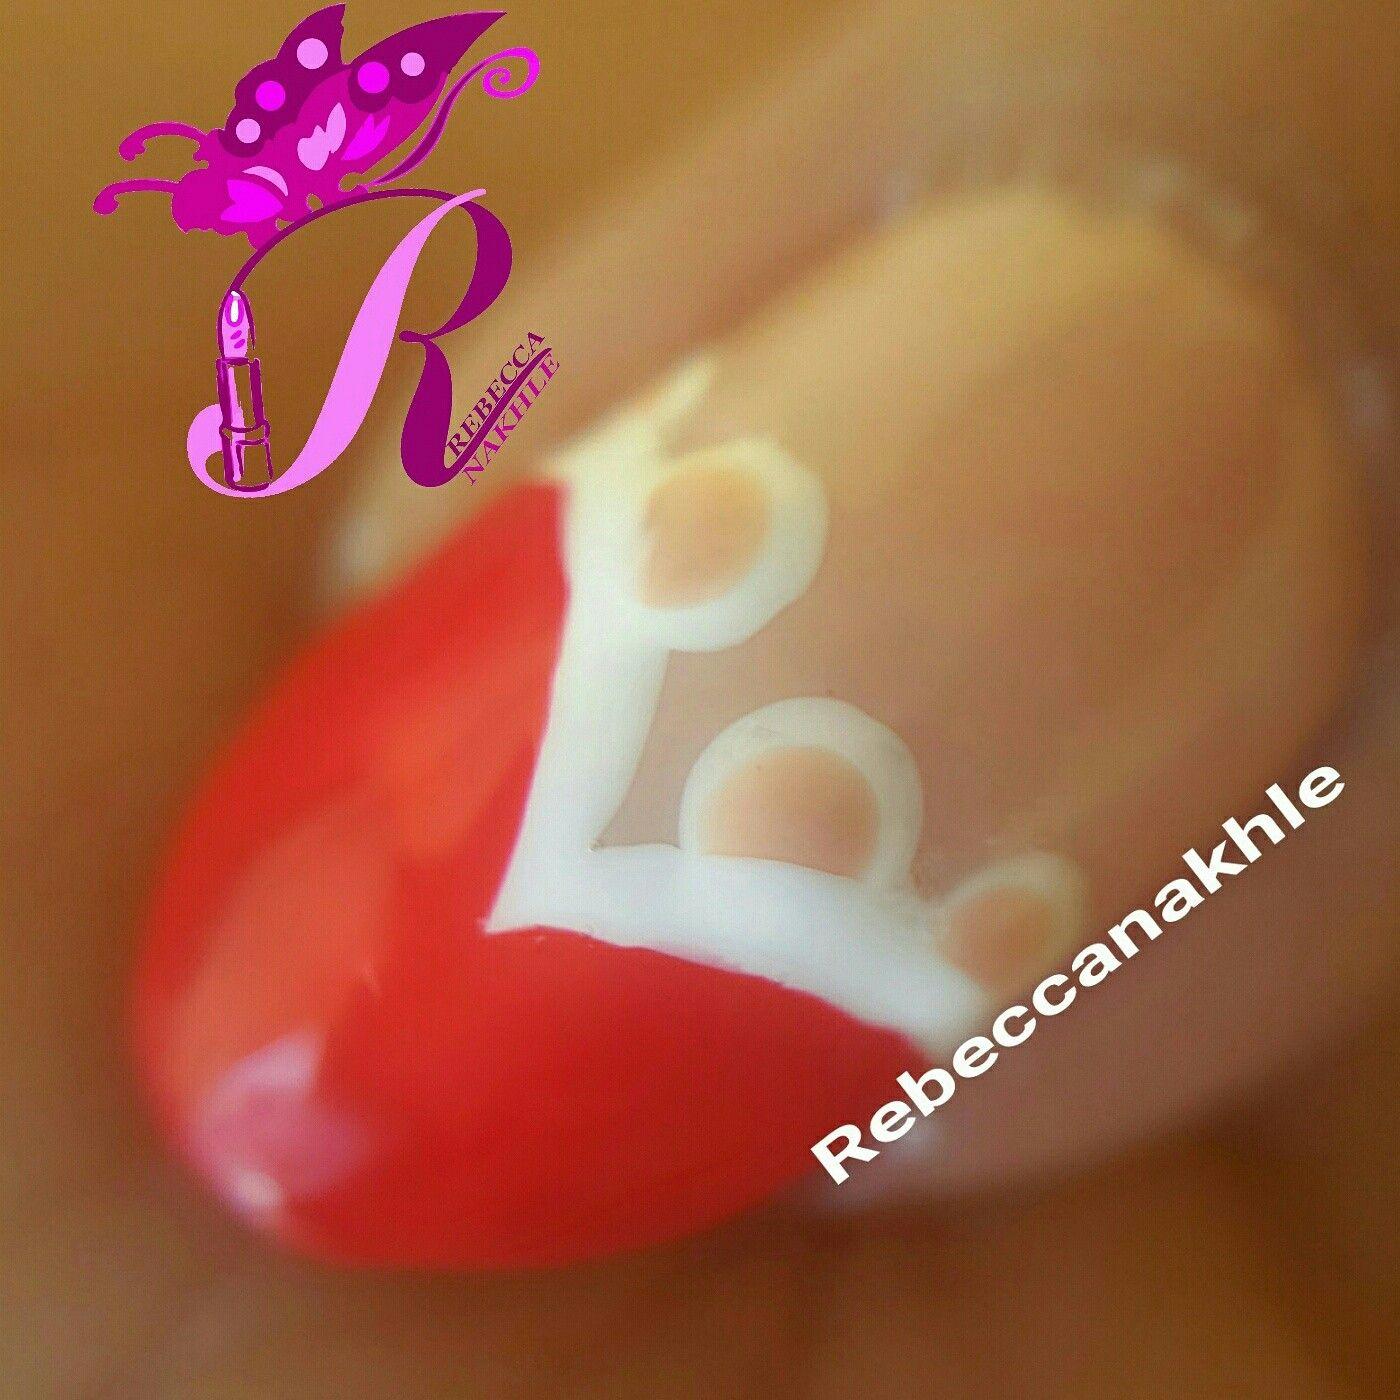 هذه #أظافر اليوم A Macro Shot of my Simple Lace Heart Nails using ...